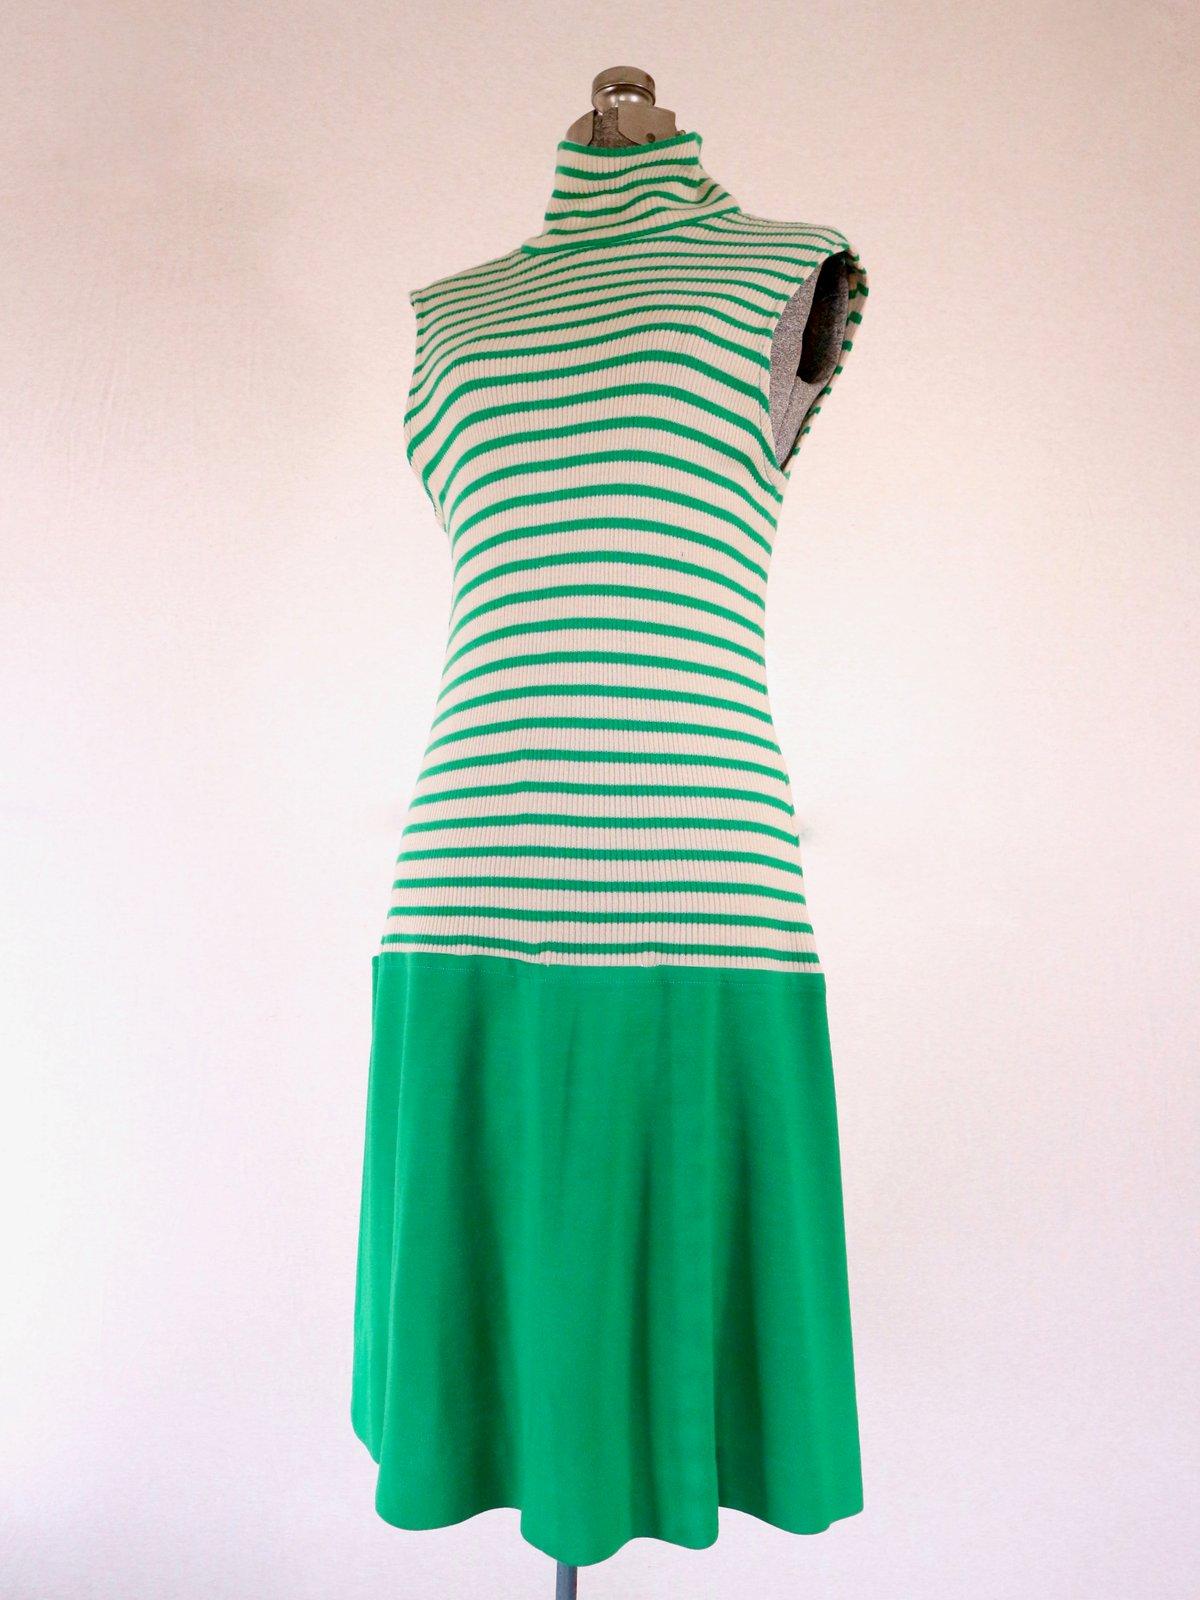 Image of Green Striped Tennis Dress —M